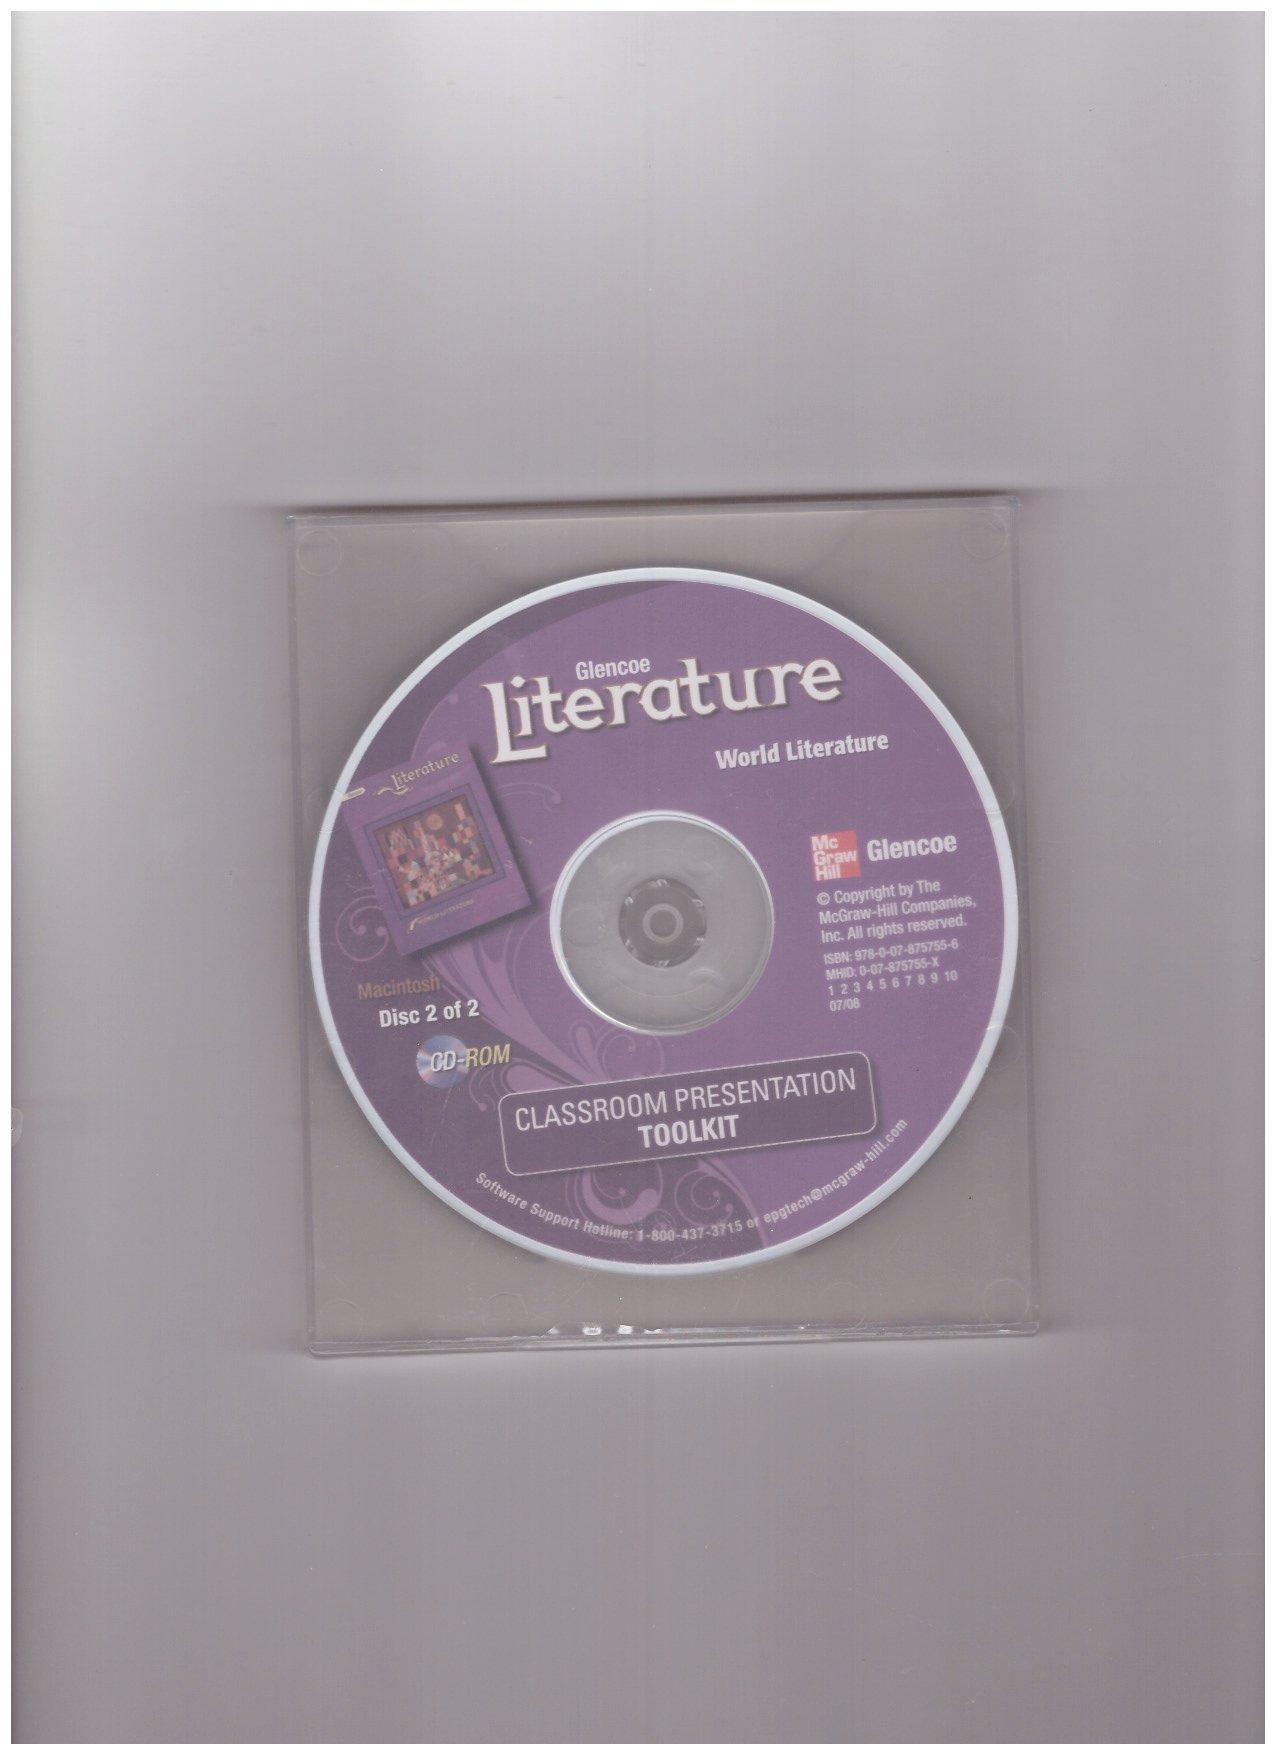 Download Glencoe Literature World Literature Classroom Presentation Toolkit PDF